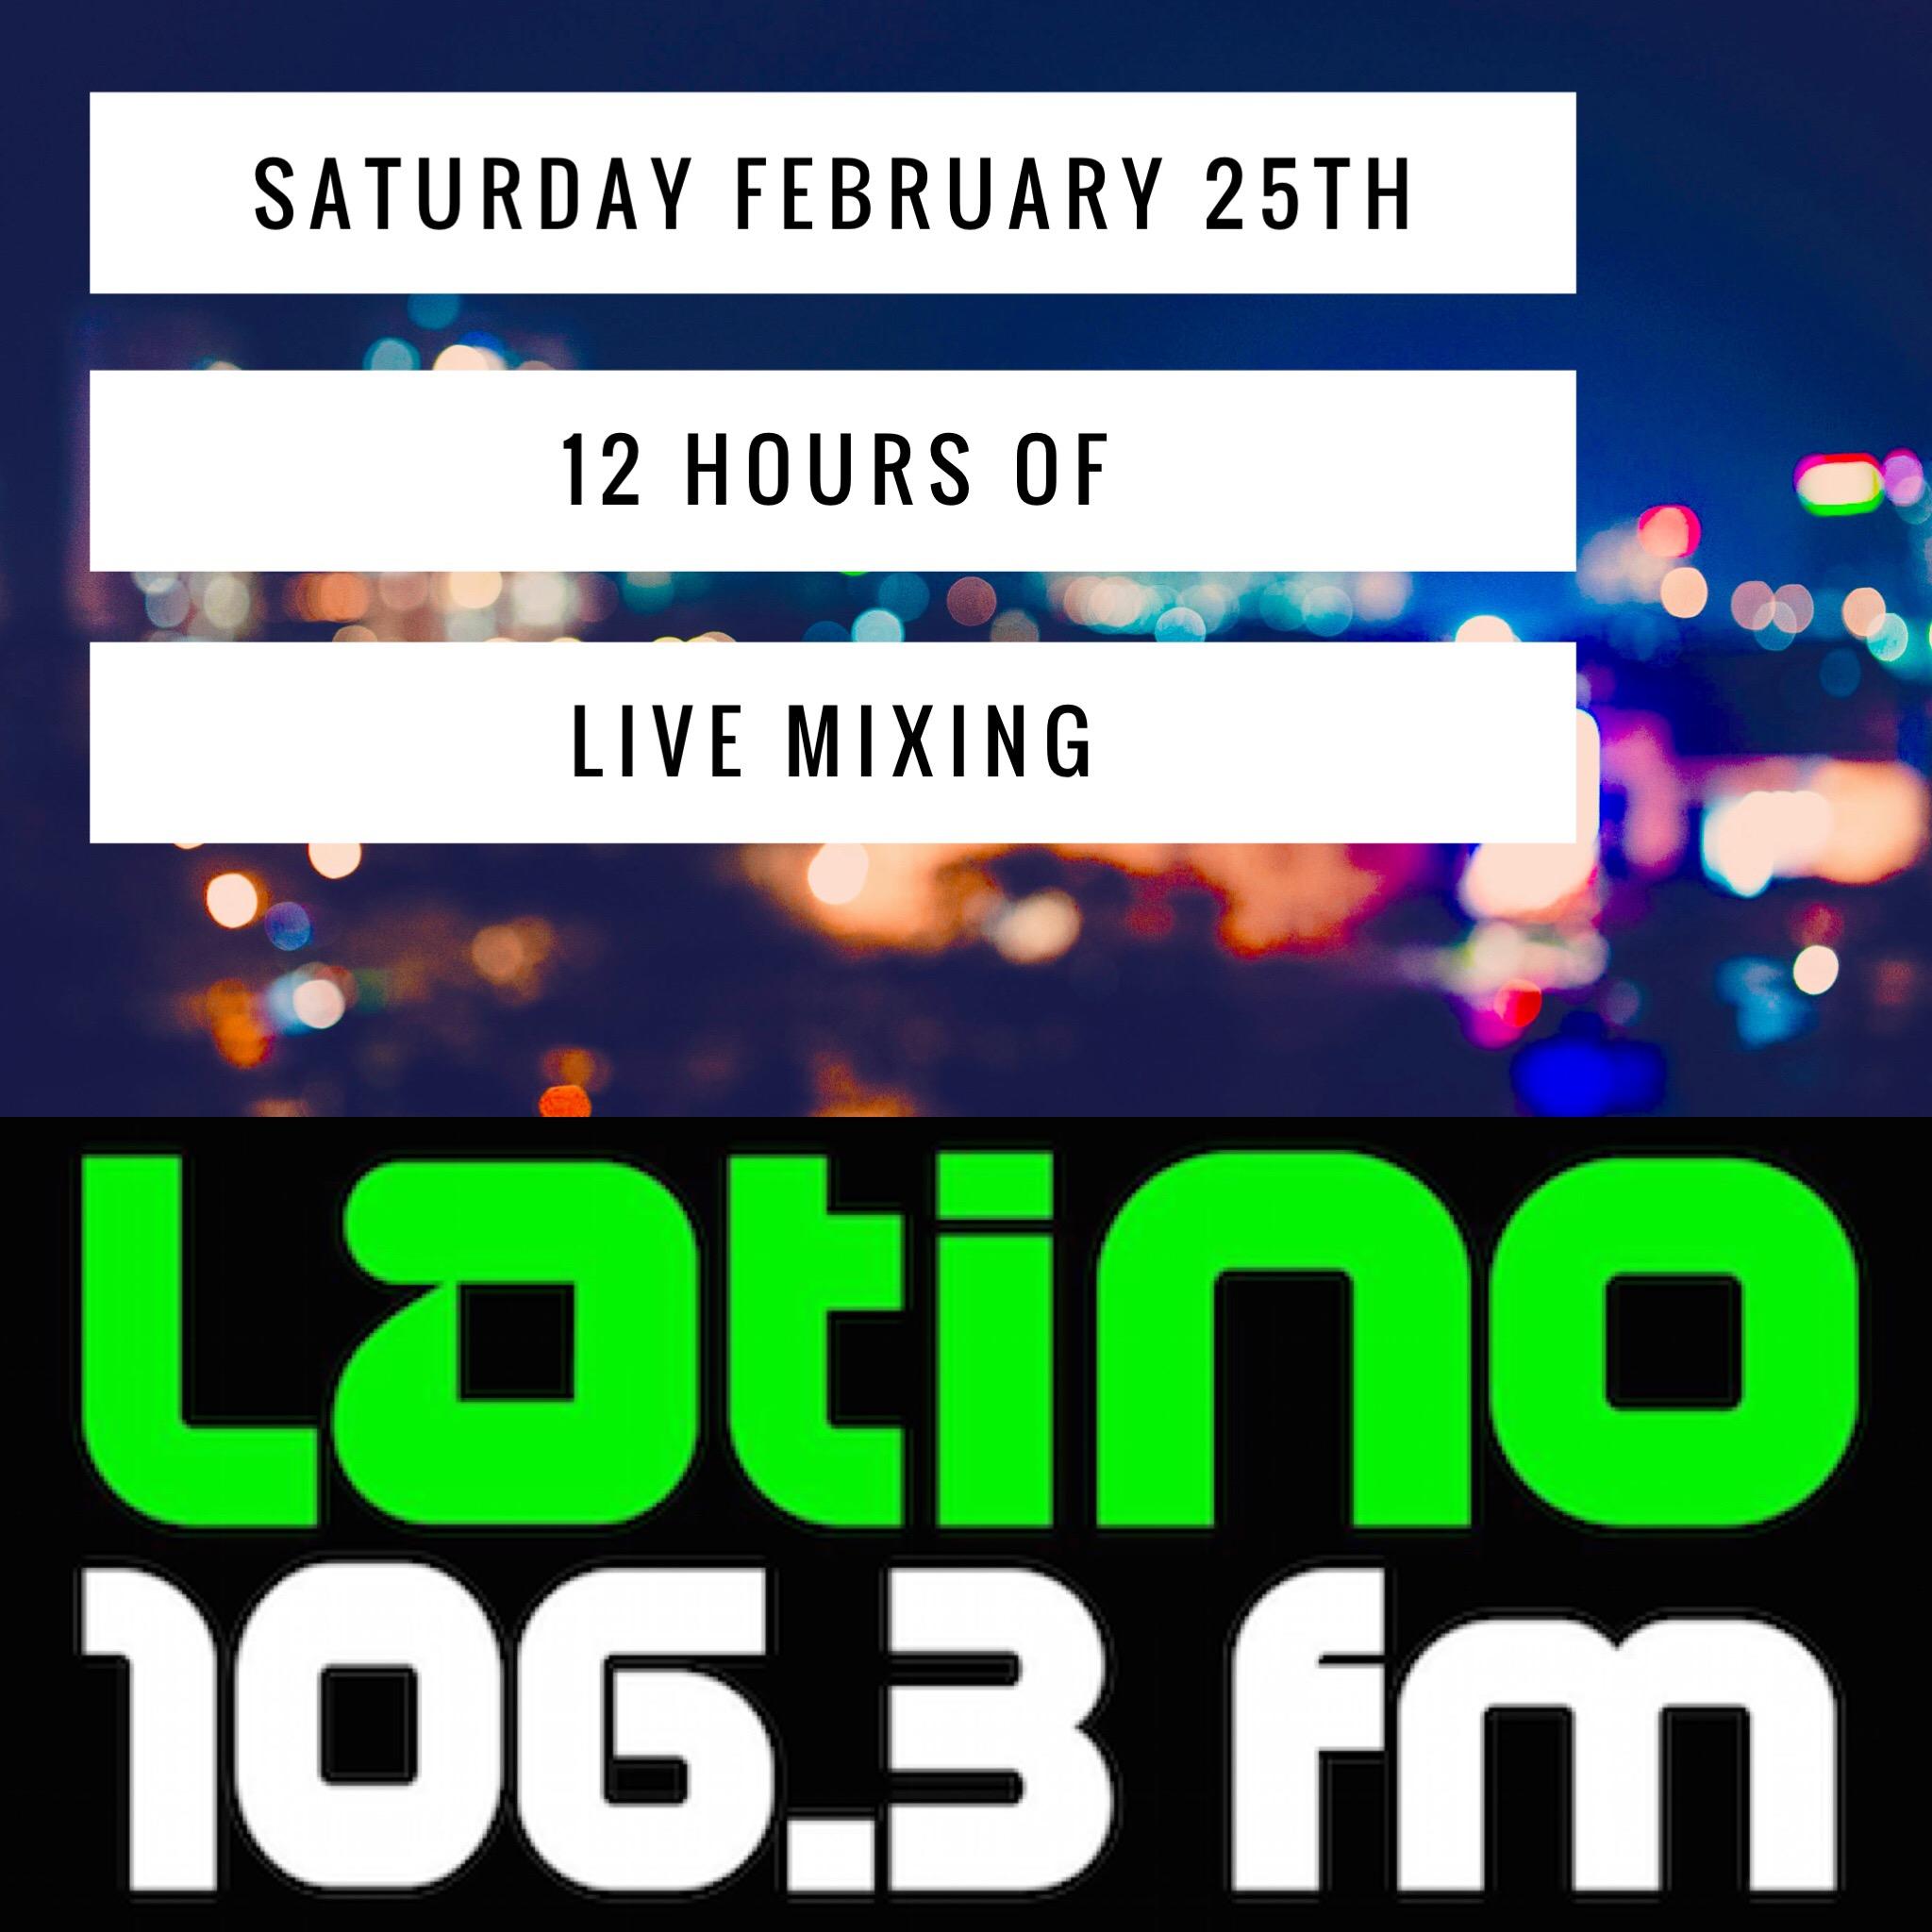 The top latin djs in salt lake on Latino 106.3 FM